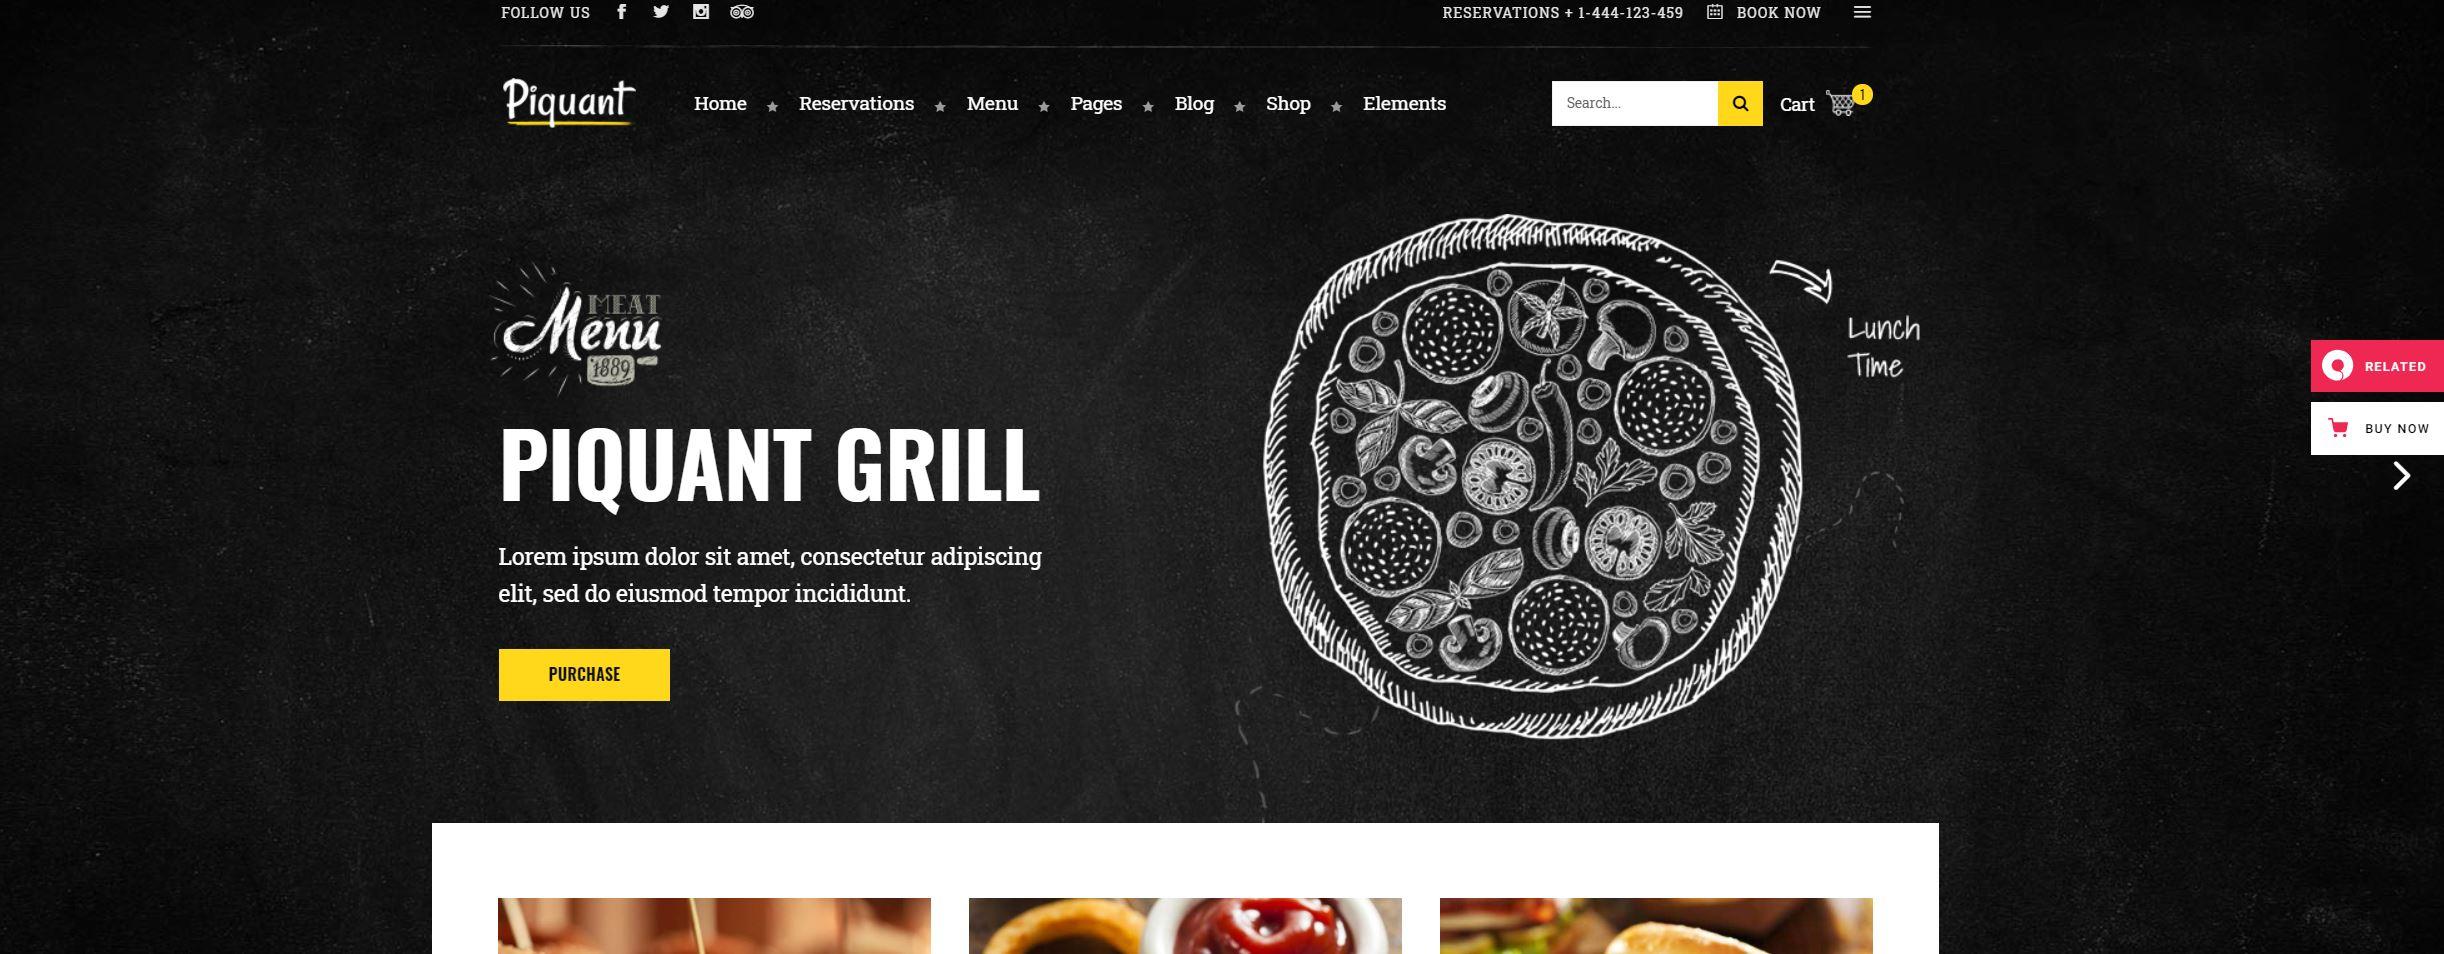 Piquant-wordpress-restaurant-theme